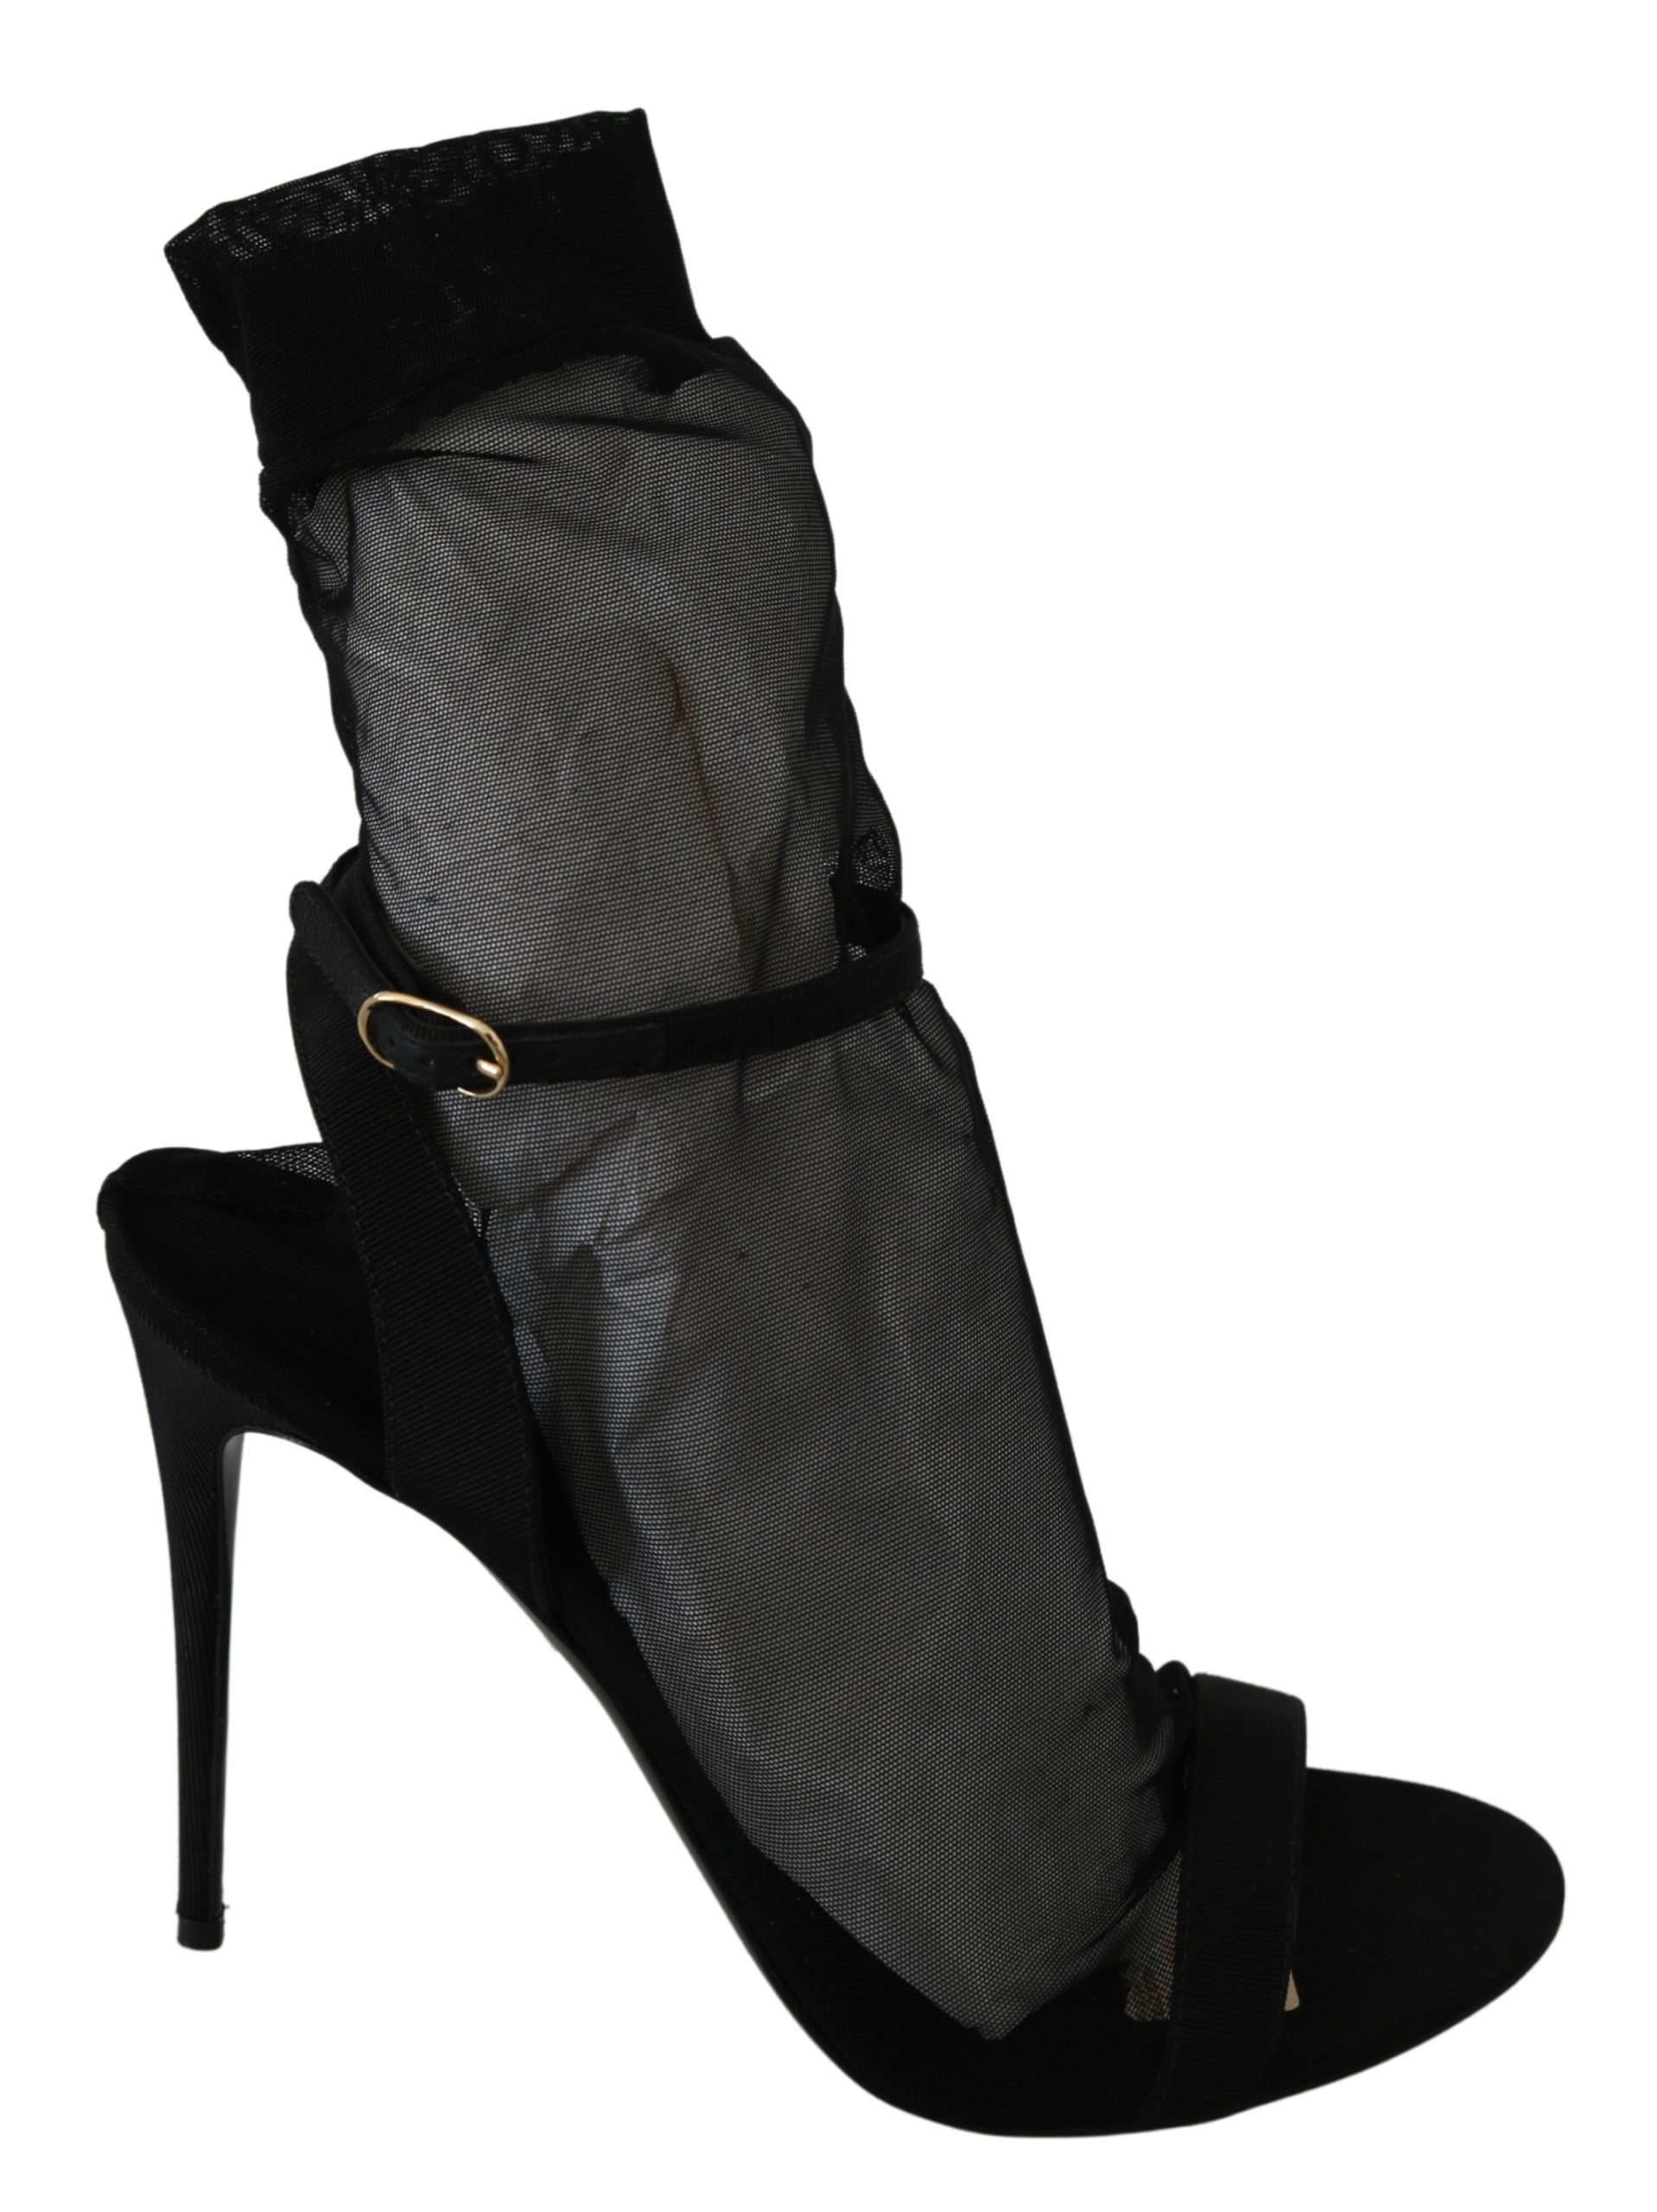 Dolce & Gabbana Women's Tulle Stretch Boots Black LA7346 - EU39/US8.5